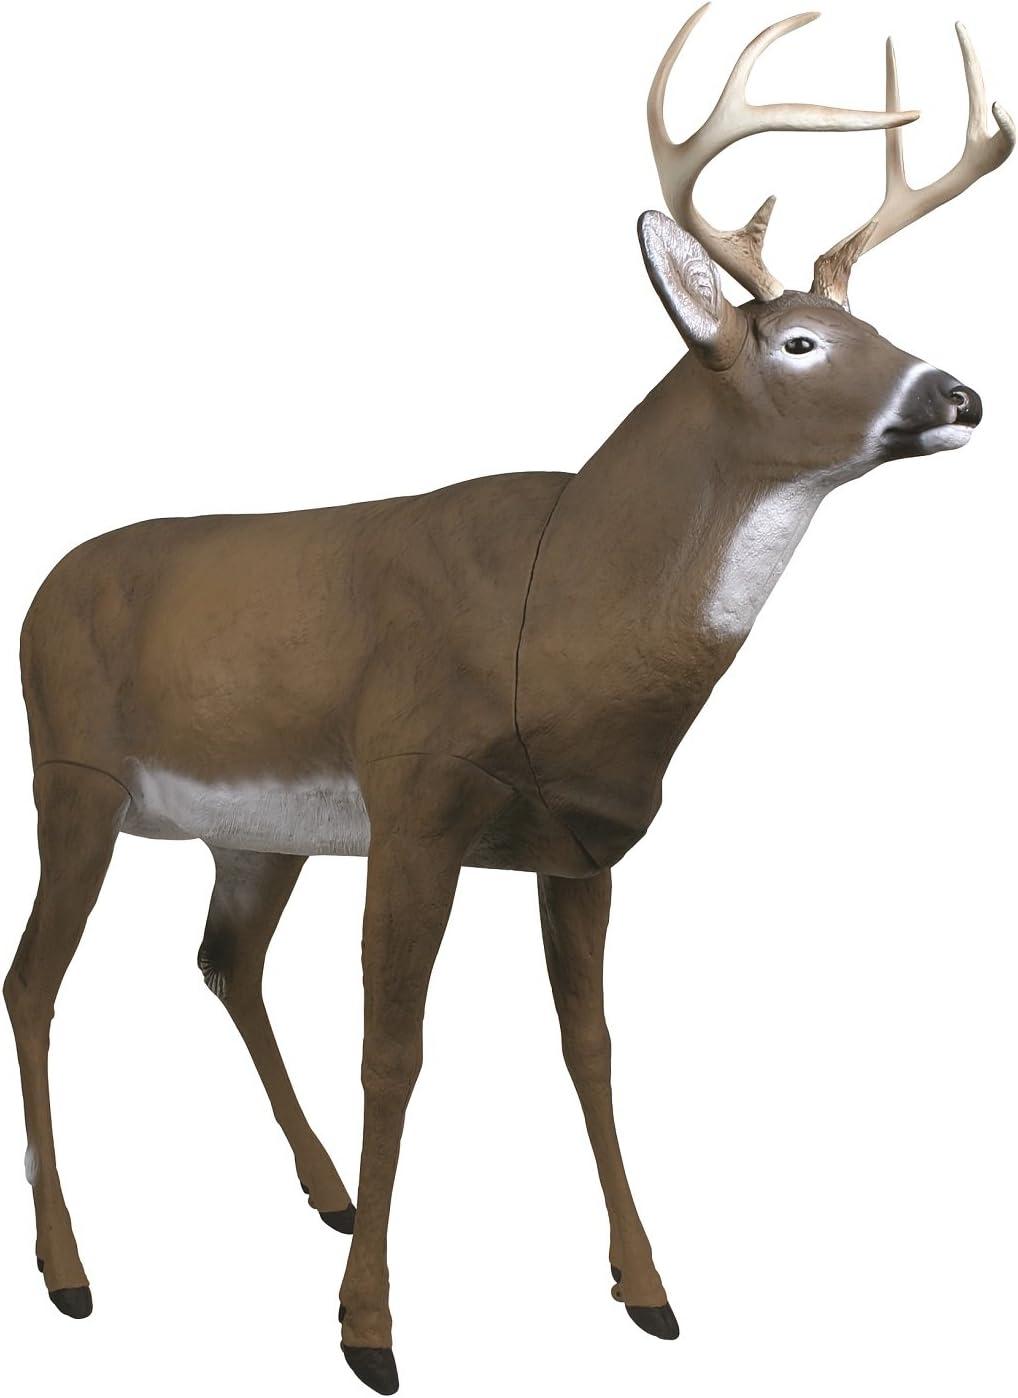 Flambeau Outdoor best Deer Decoys